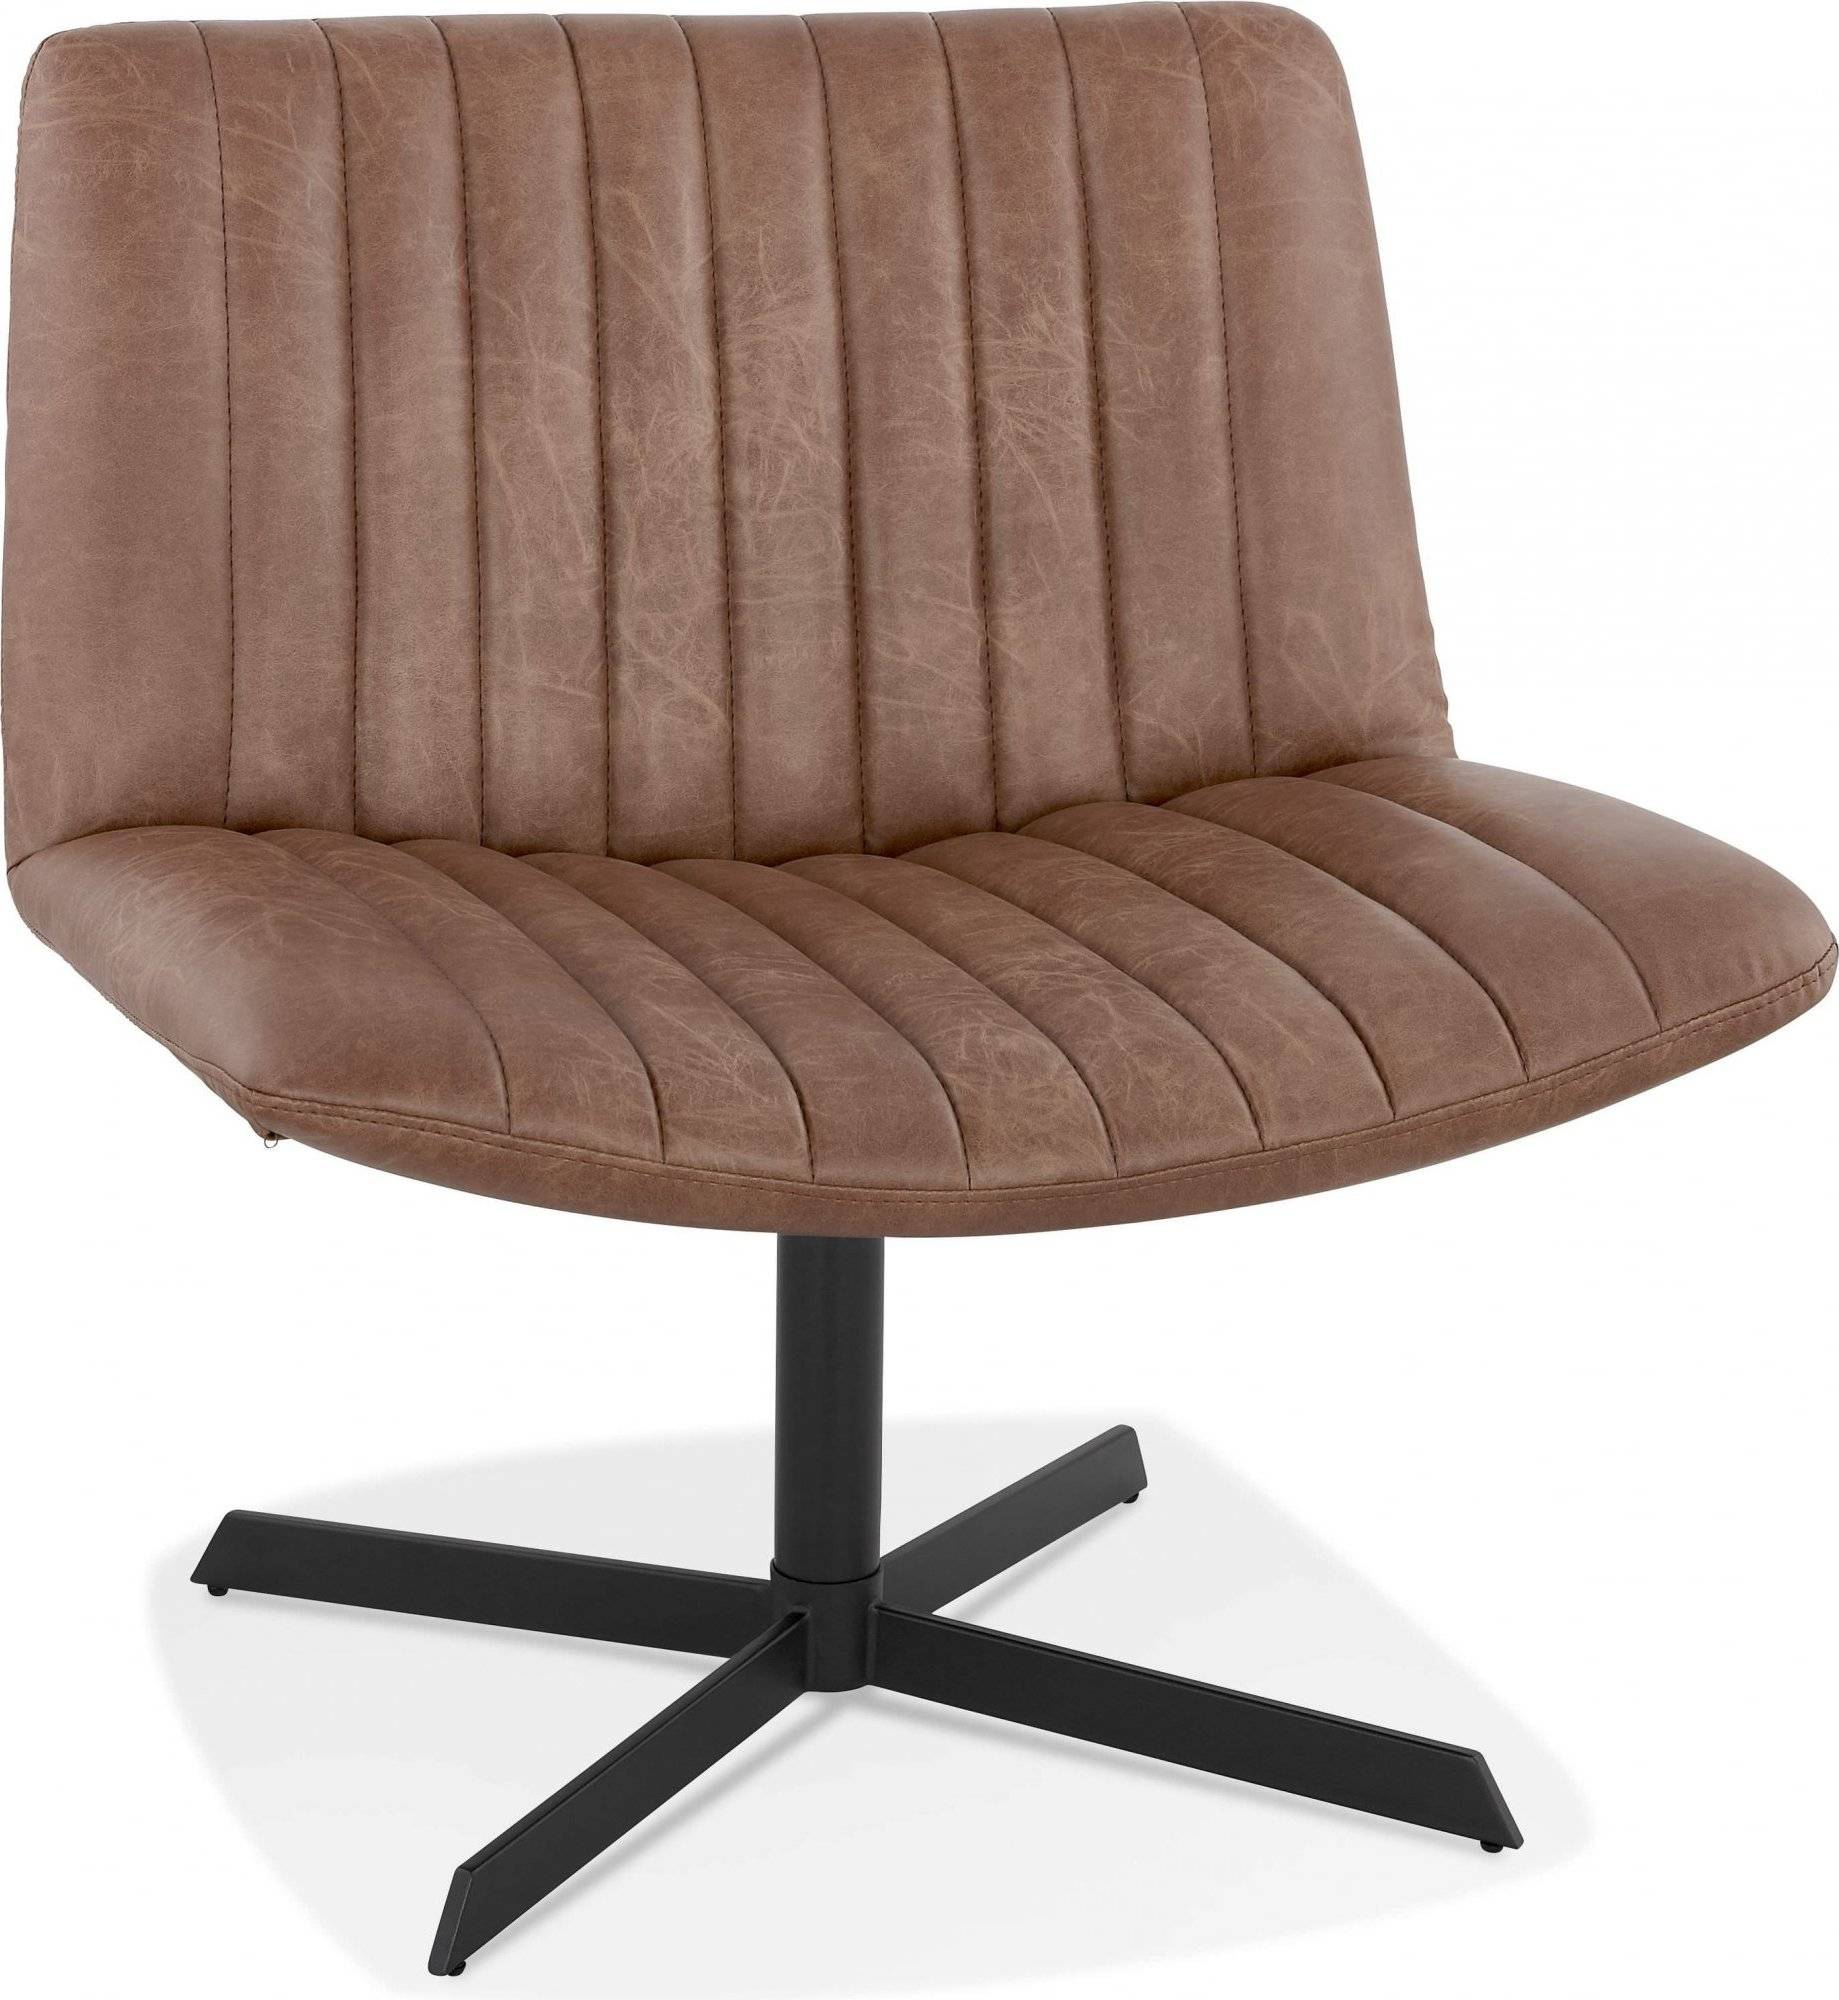 Kokoon Design Fauteuil xxl rotation 360 couleur marron